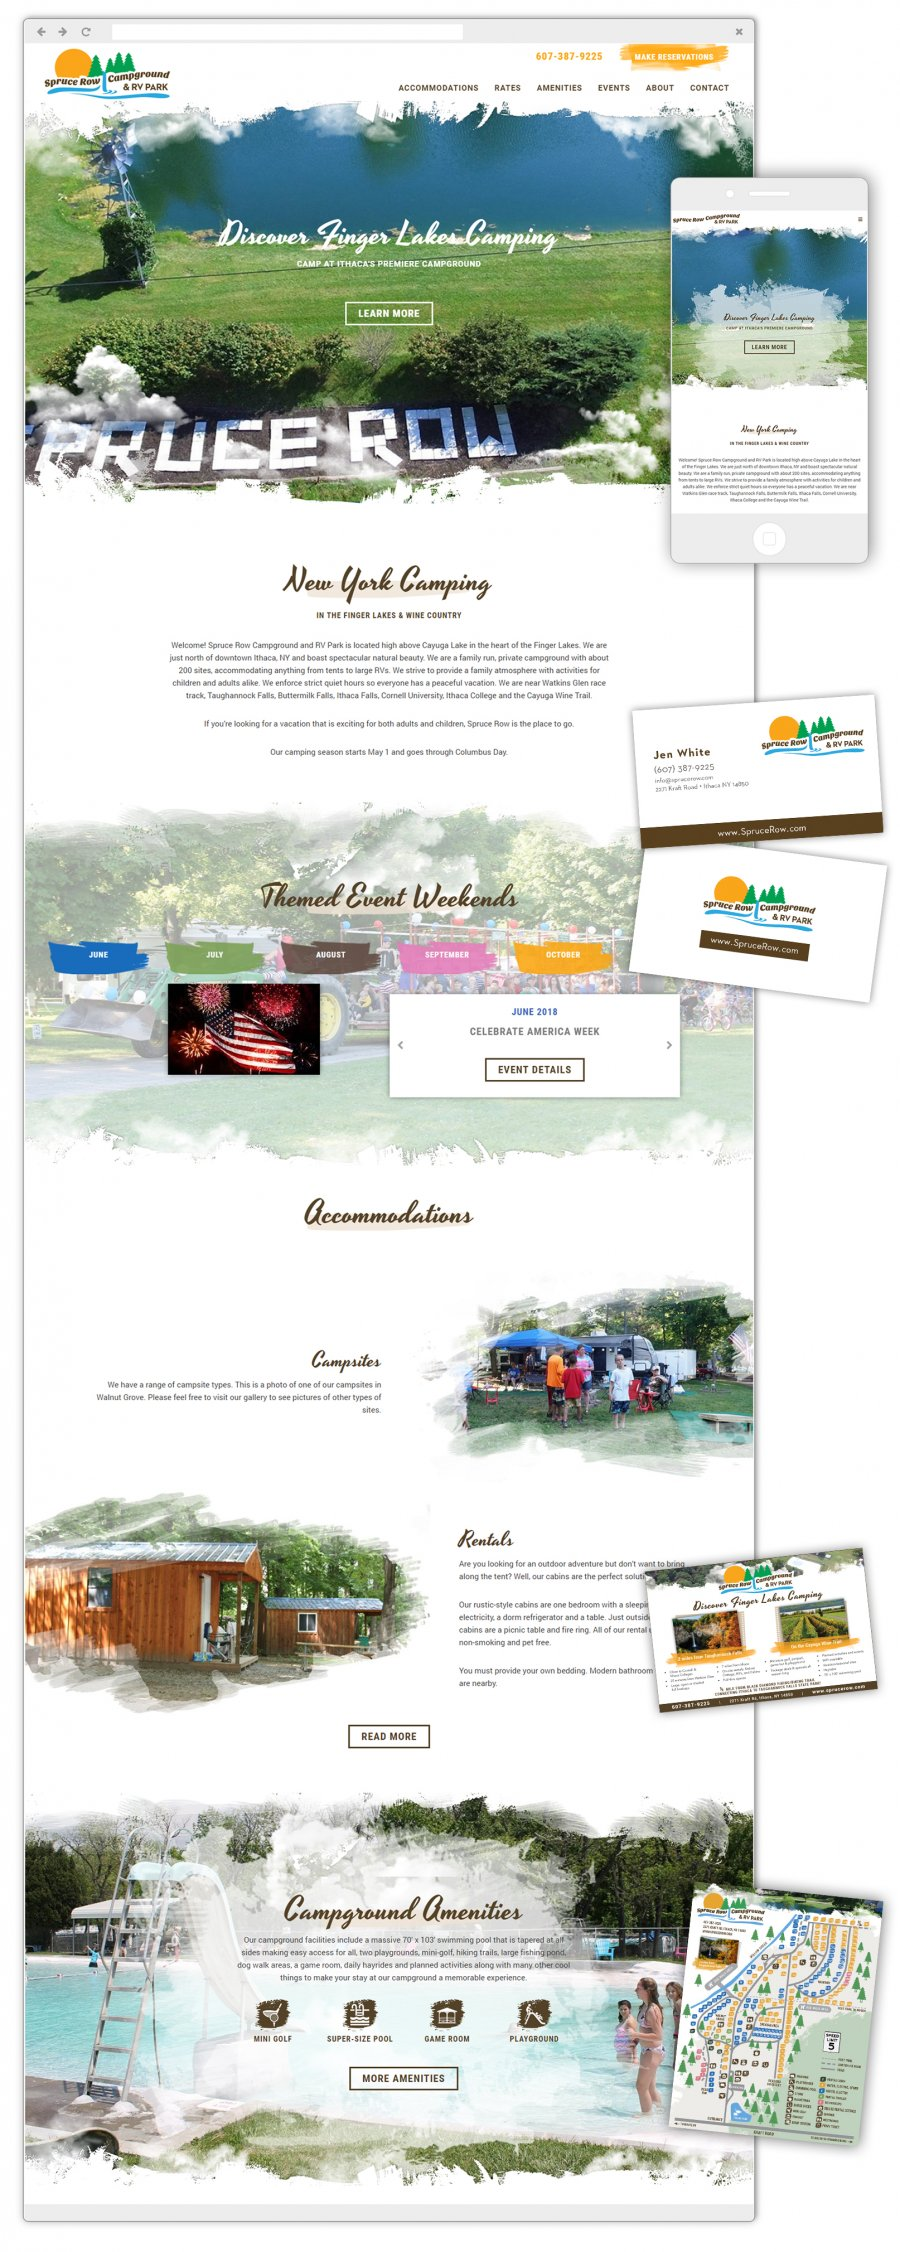 Spruce Row Campground & RV Park Responsive Website